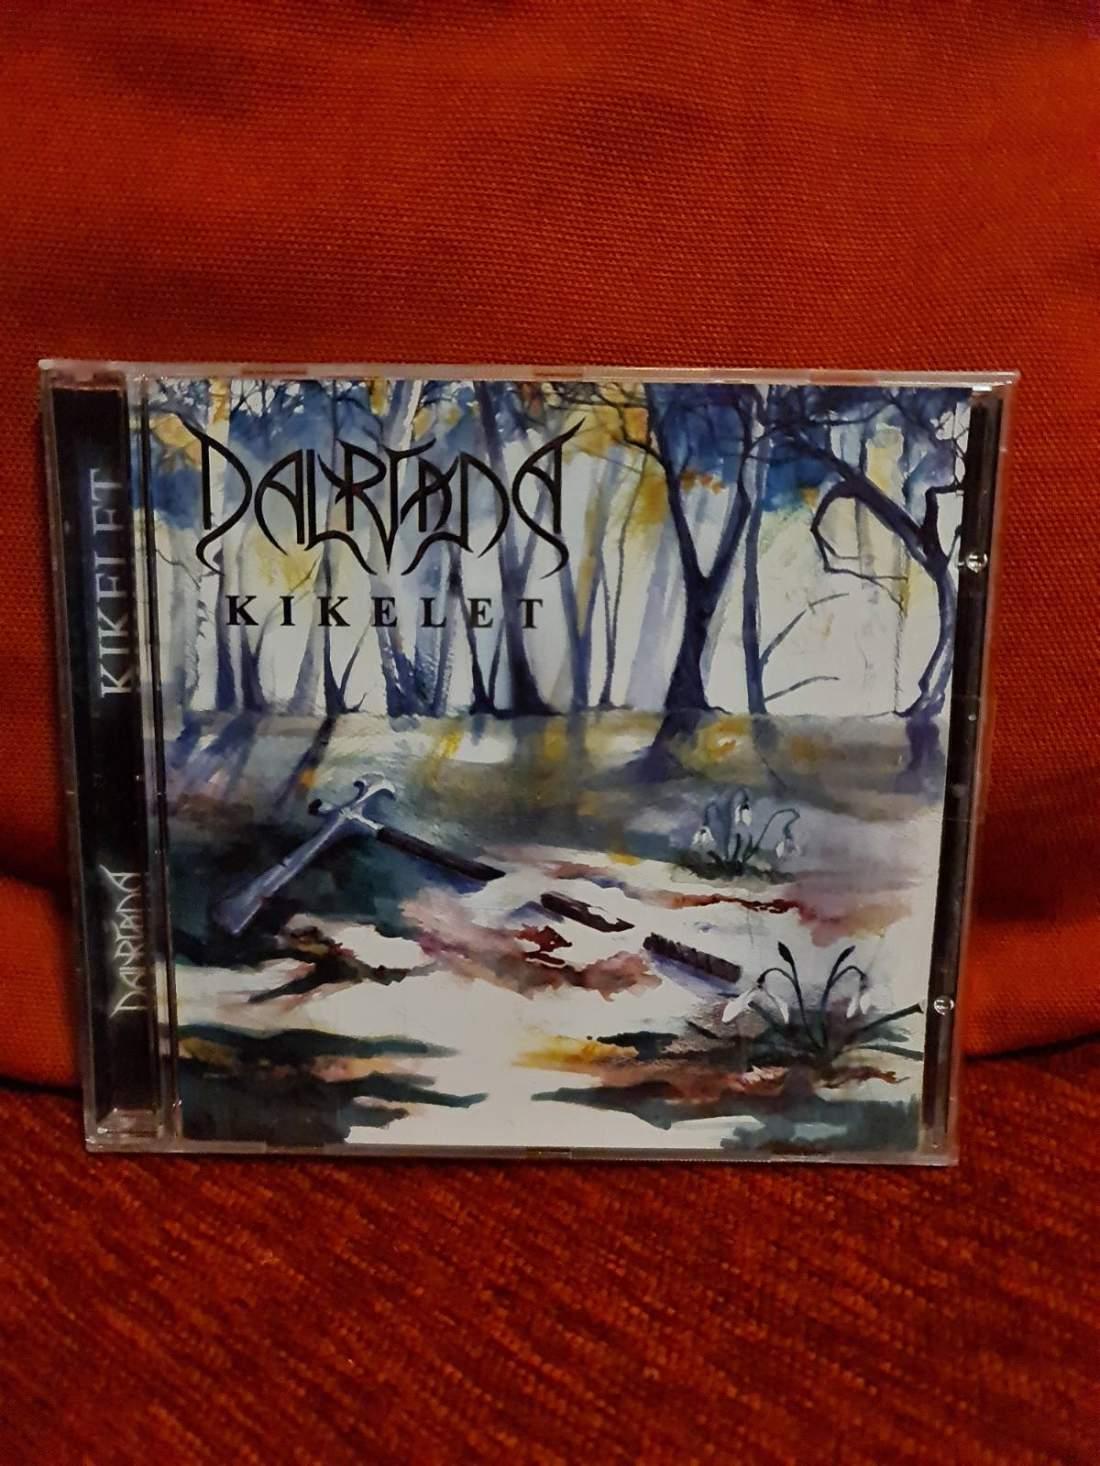 DALRIADA - KIKELET CD